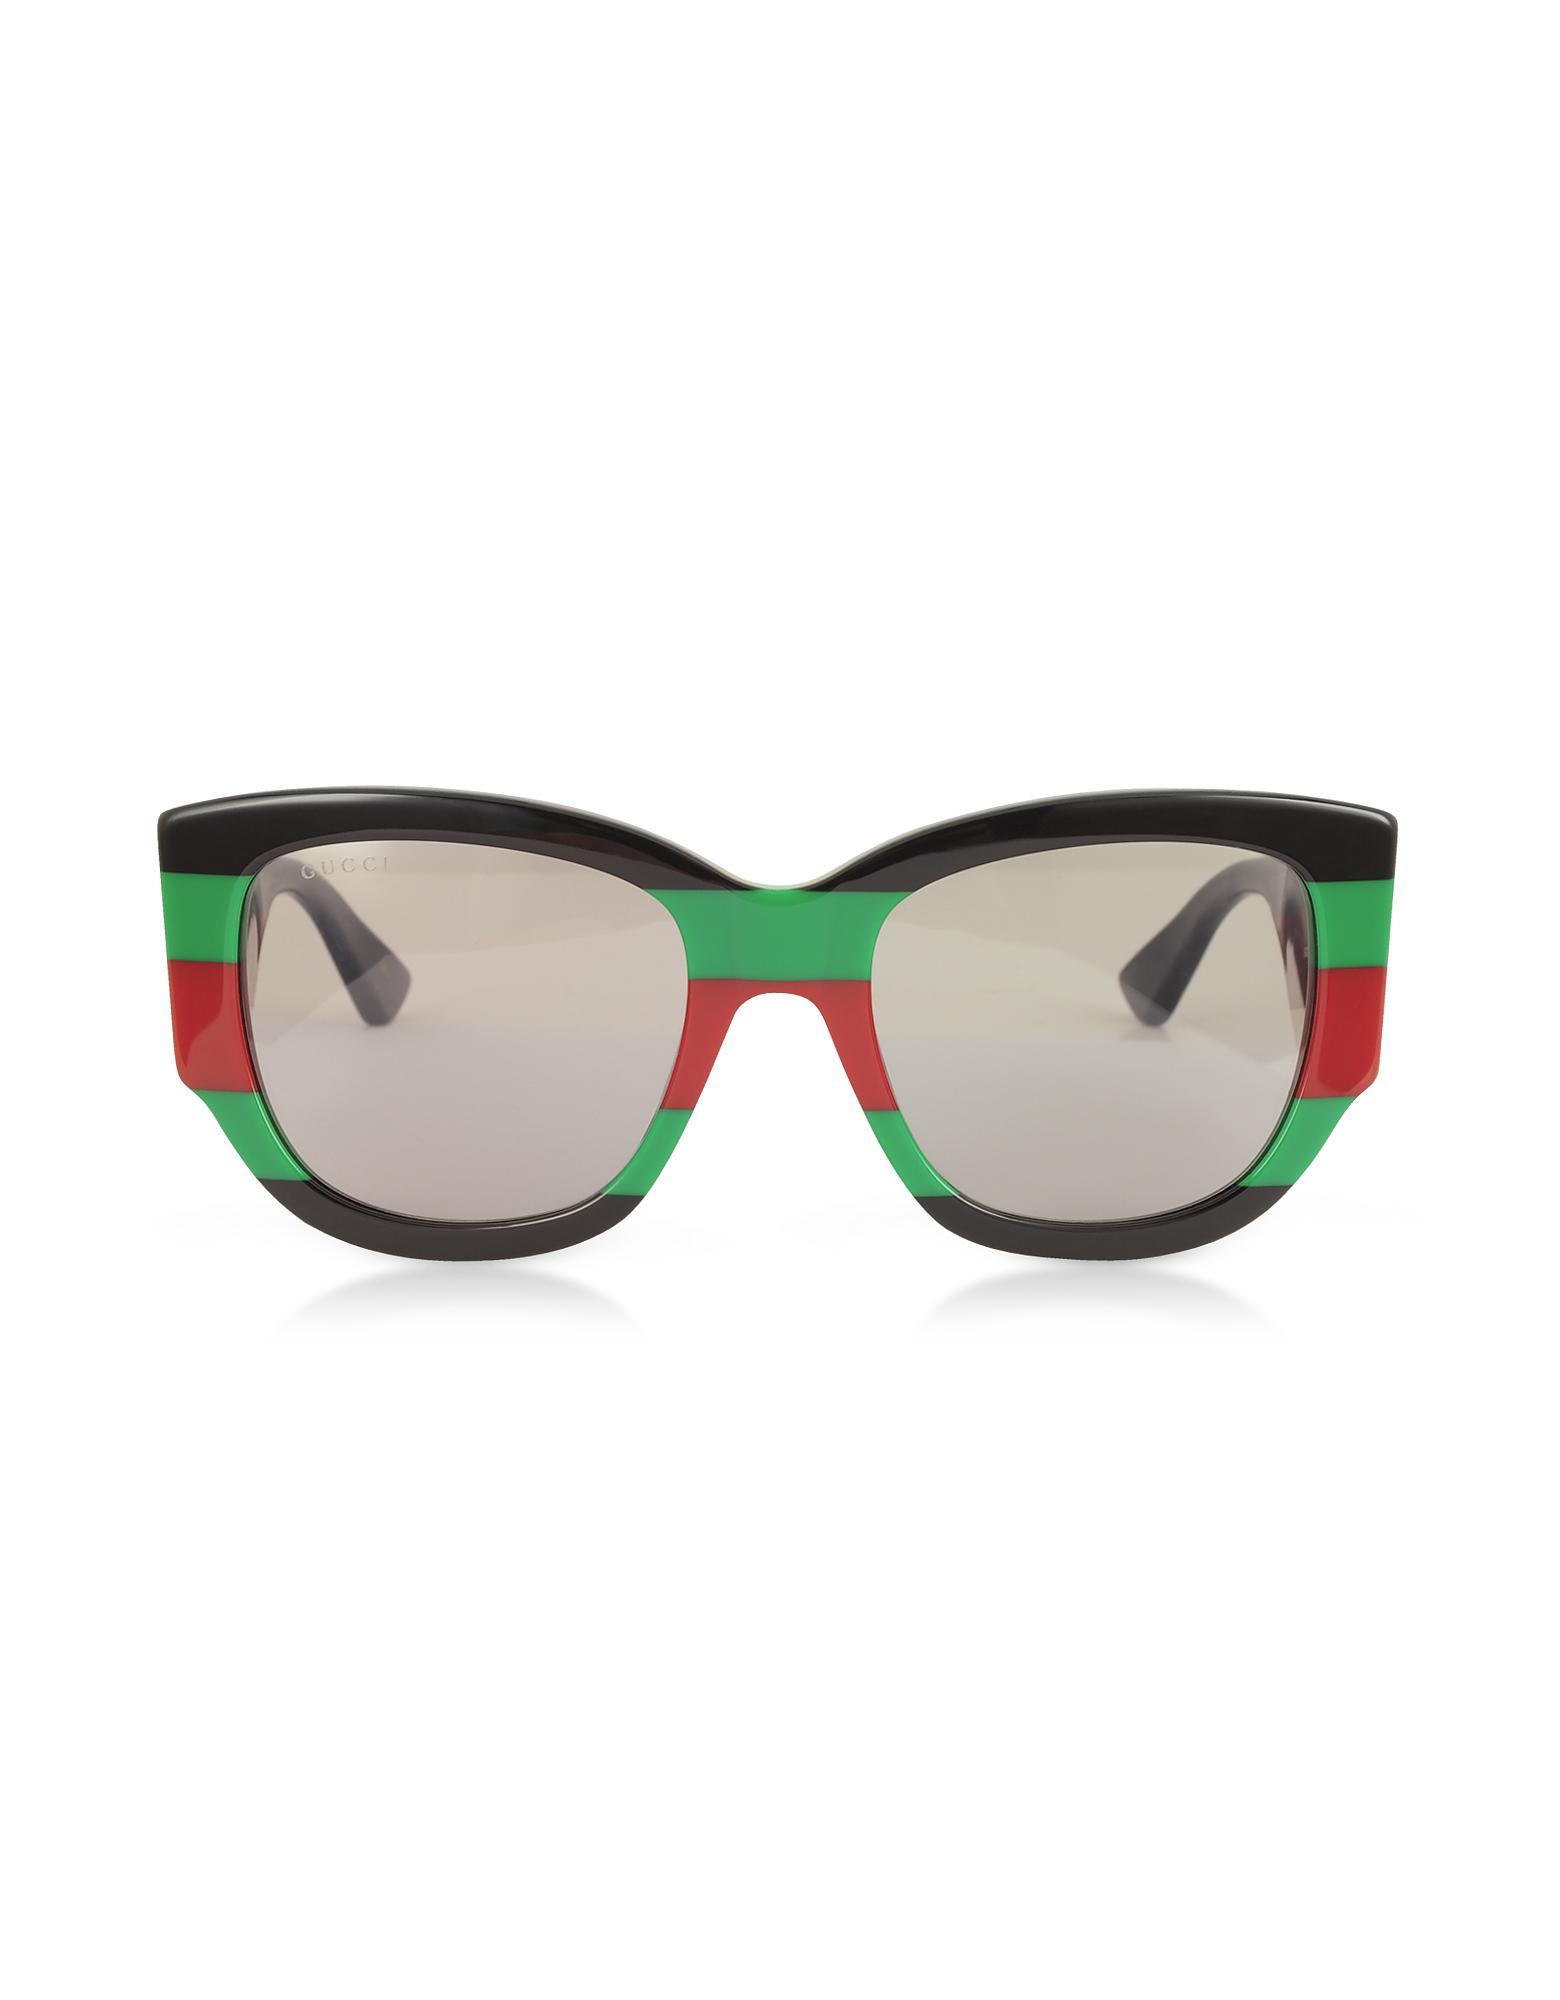 11fc1594d25 Gucci. Women s Black GG0276S Colour Block Oversize Cat Eye Acetate  Sunglassesw sylvie Web Temples